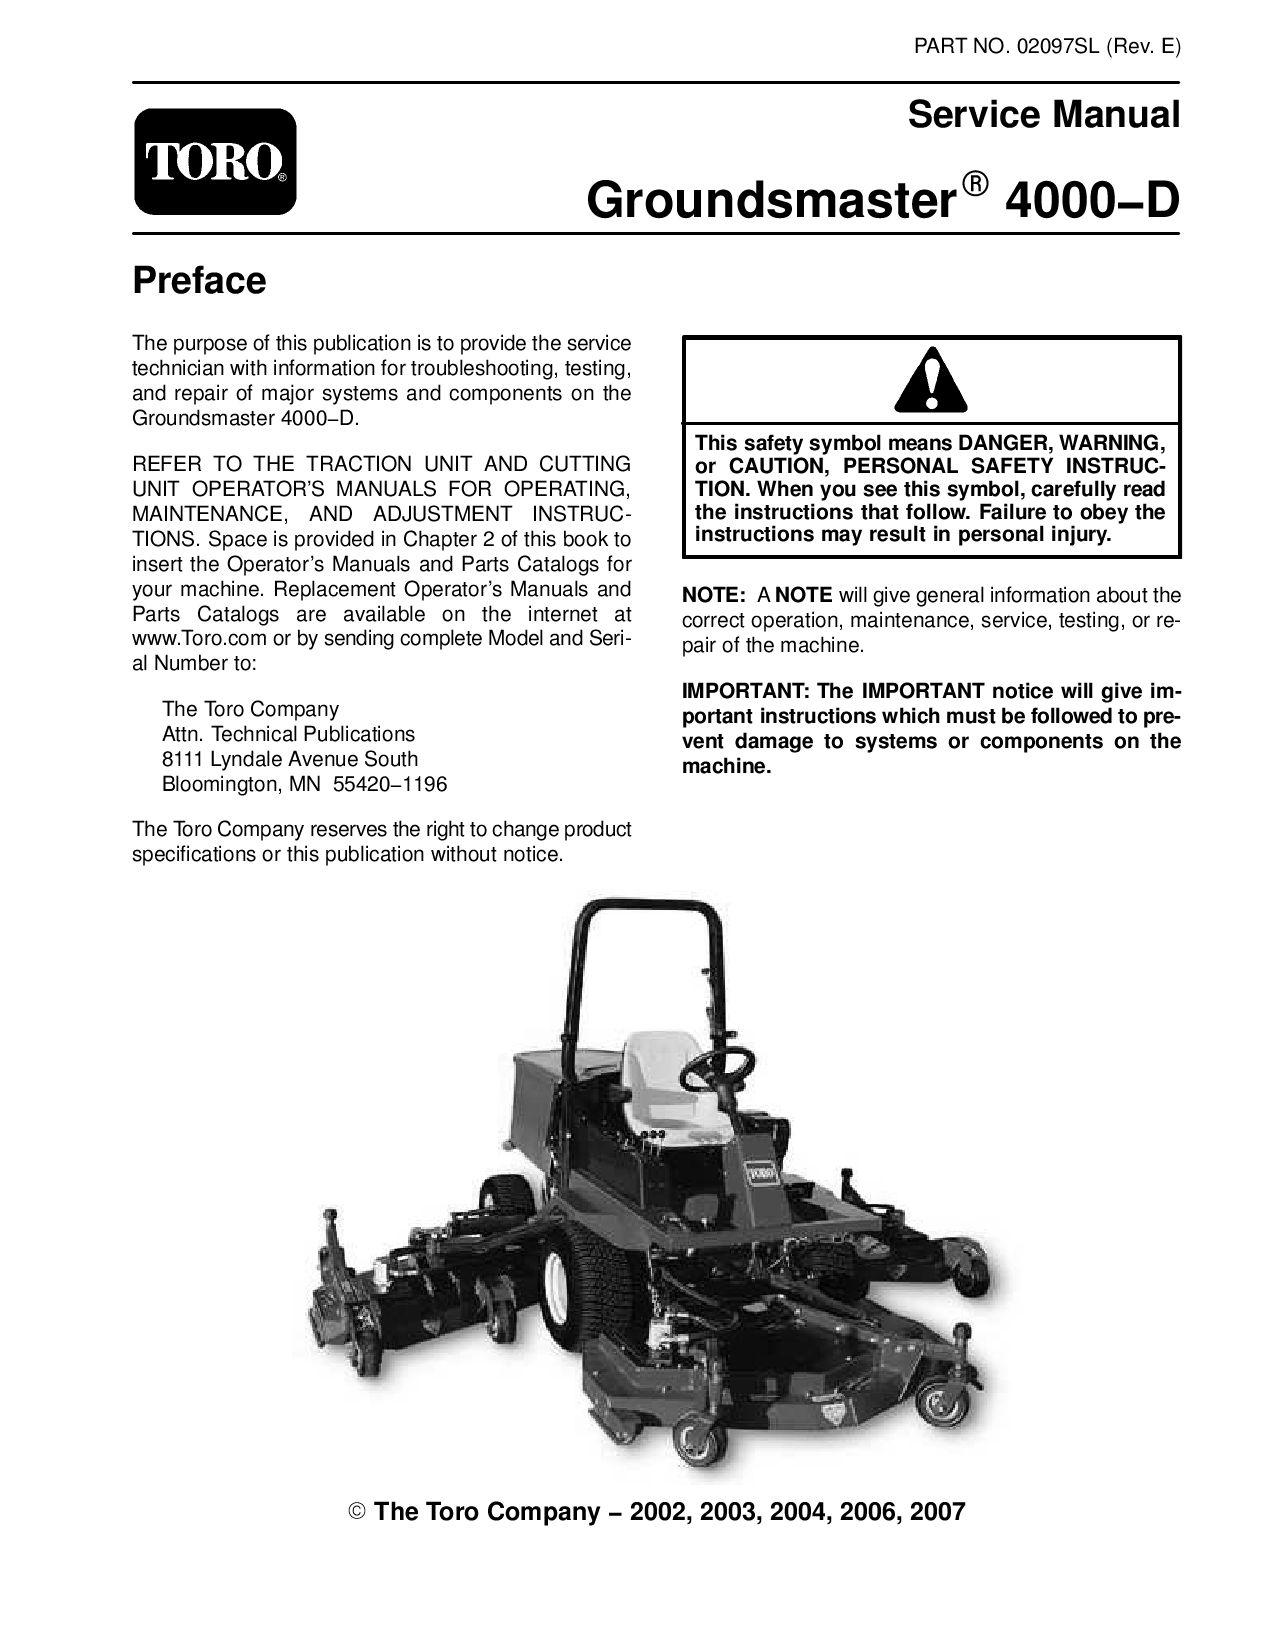 02097sl pdf groundsmaster 4000-d (model 30410) (rev e) dec, 2007 by  negimachi negimachi - issuu